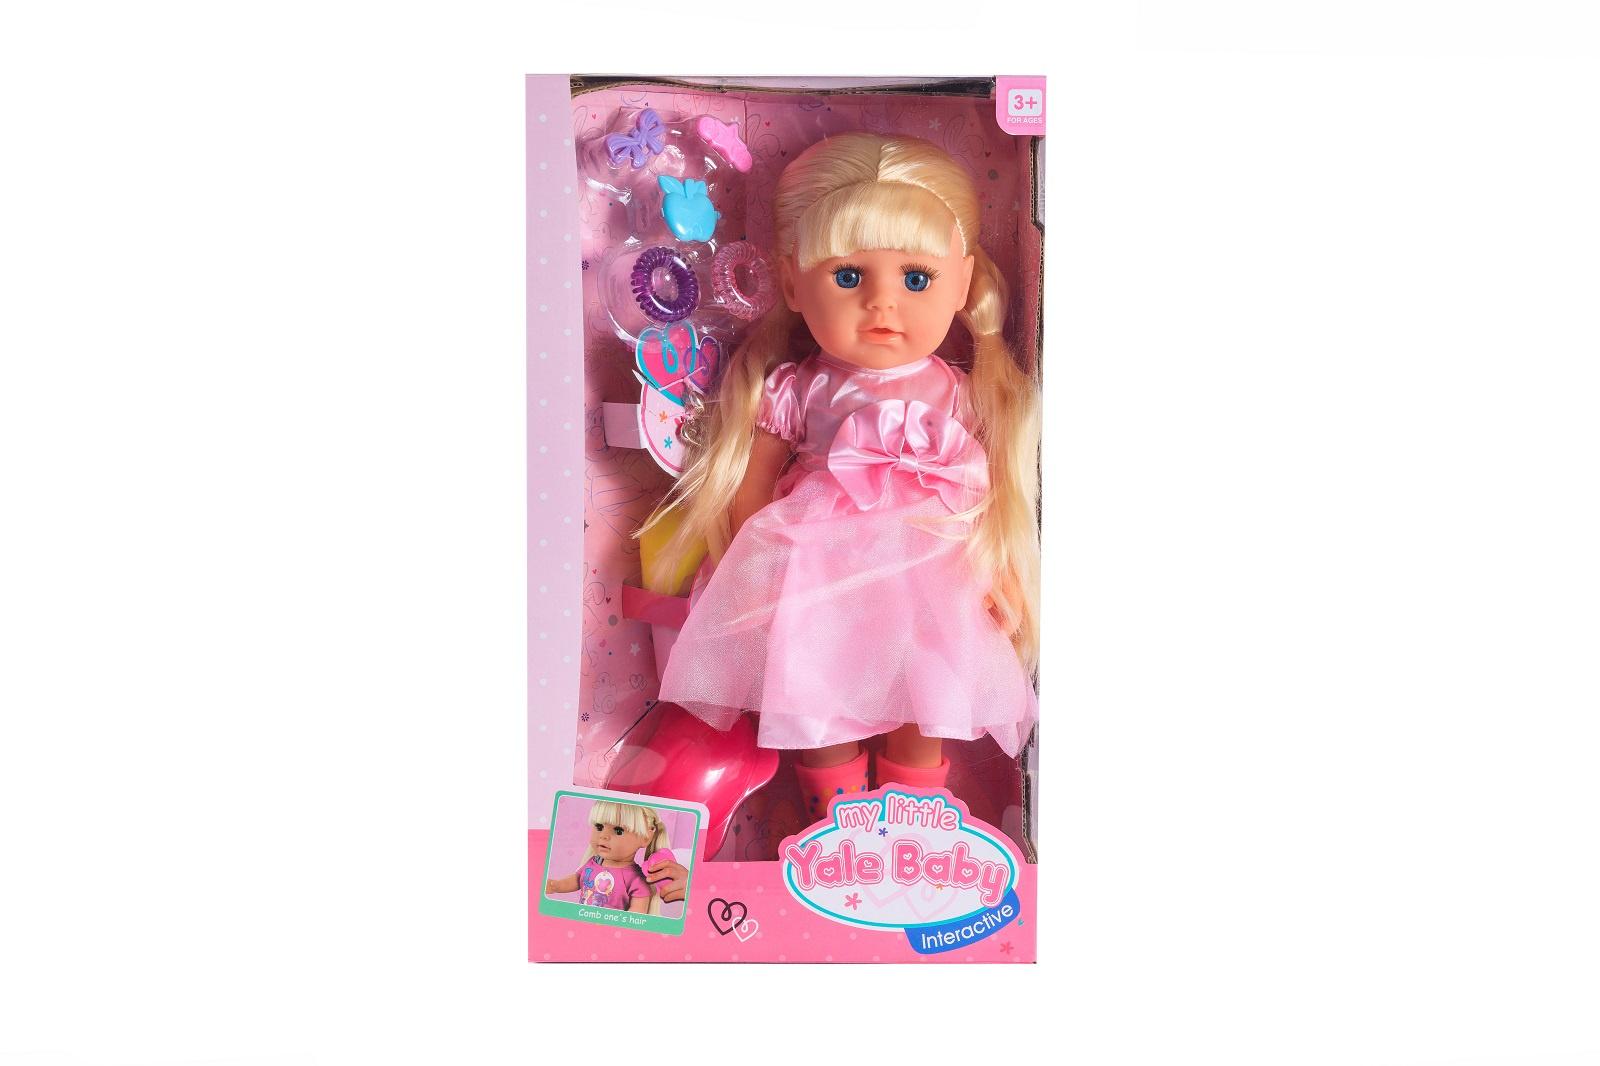 Кукла функциональная Sister, с аксессуарами, 40 см s s toys 012 03 с фигурками и аксессуарами